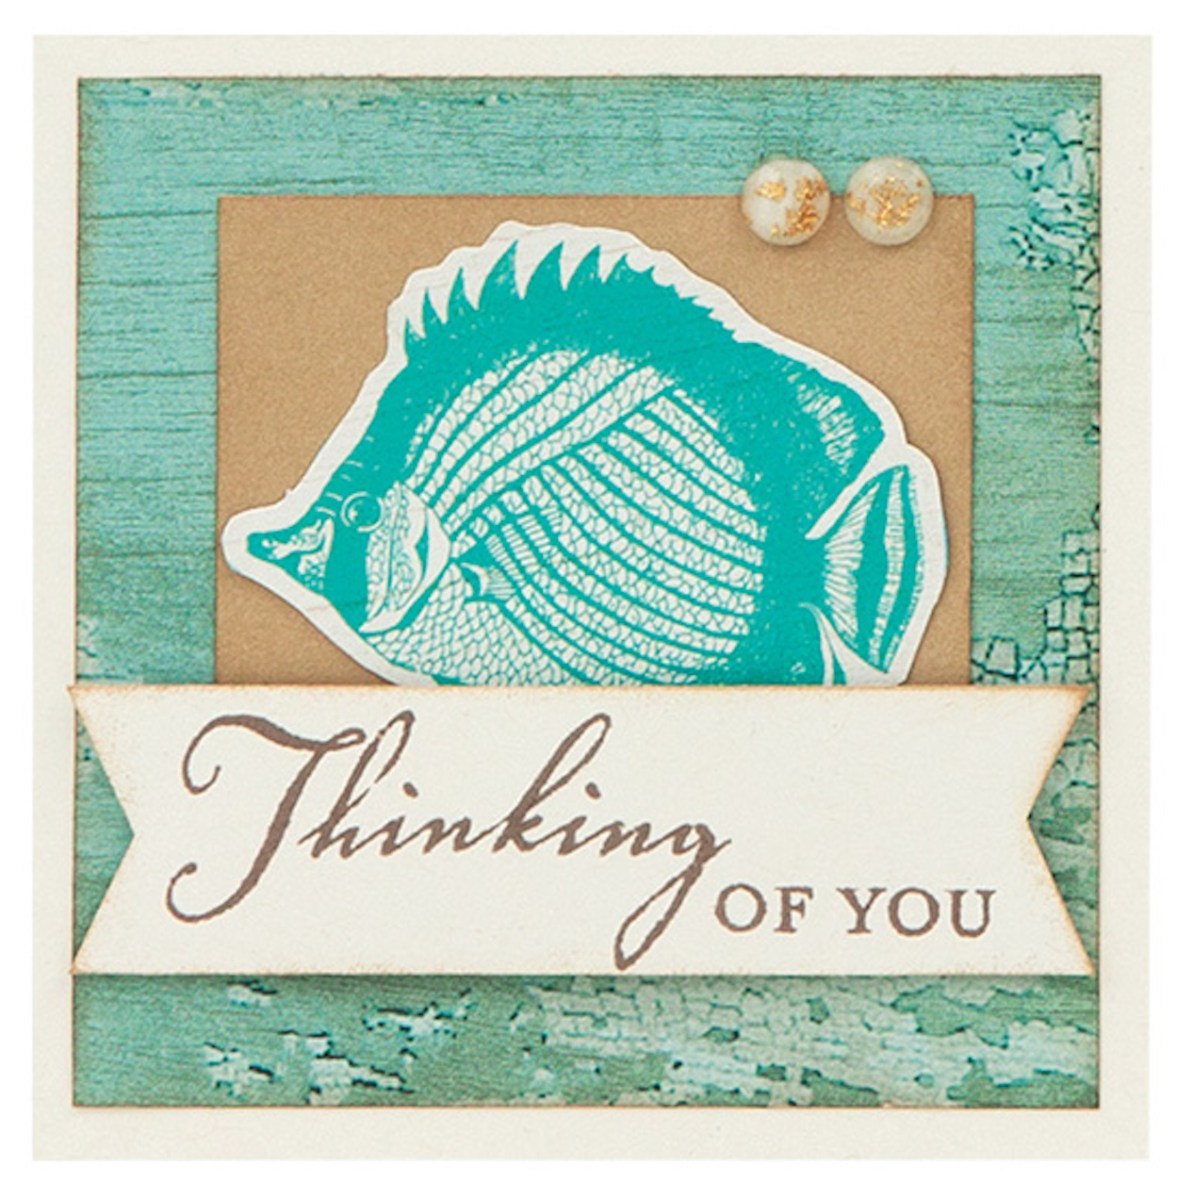 Making Memories by the Seaside #ctmh #closetomyheart #ctmhseaside #bringbackmypack #scrapbooking #cardmaking #patterns #workshopguide #beach #vacation #holiday #summer